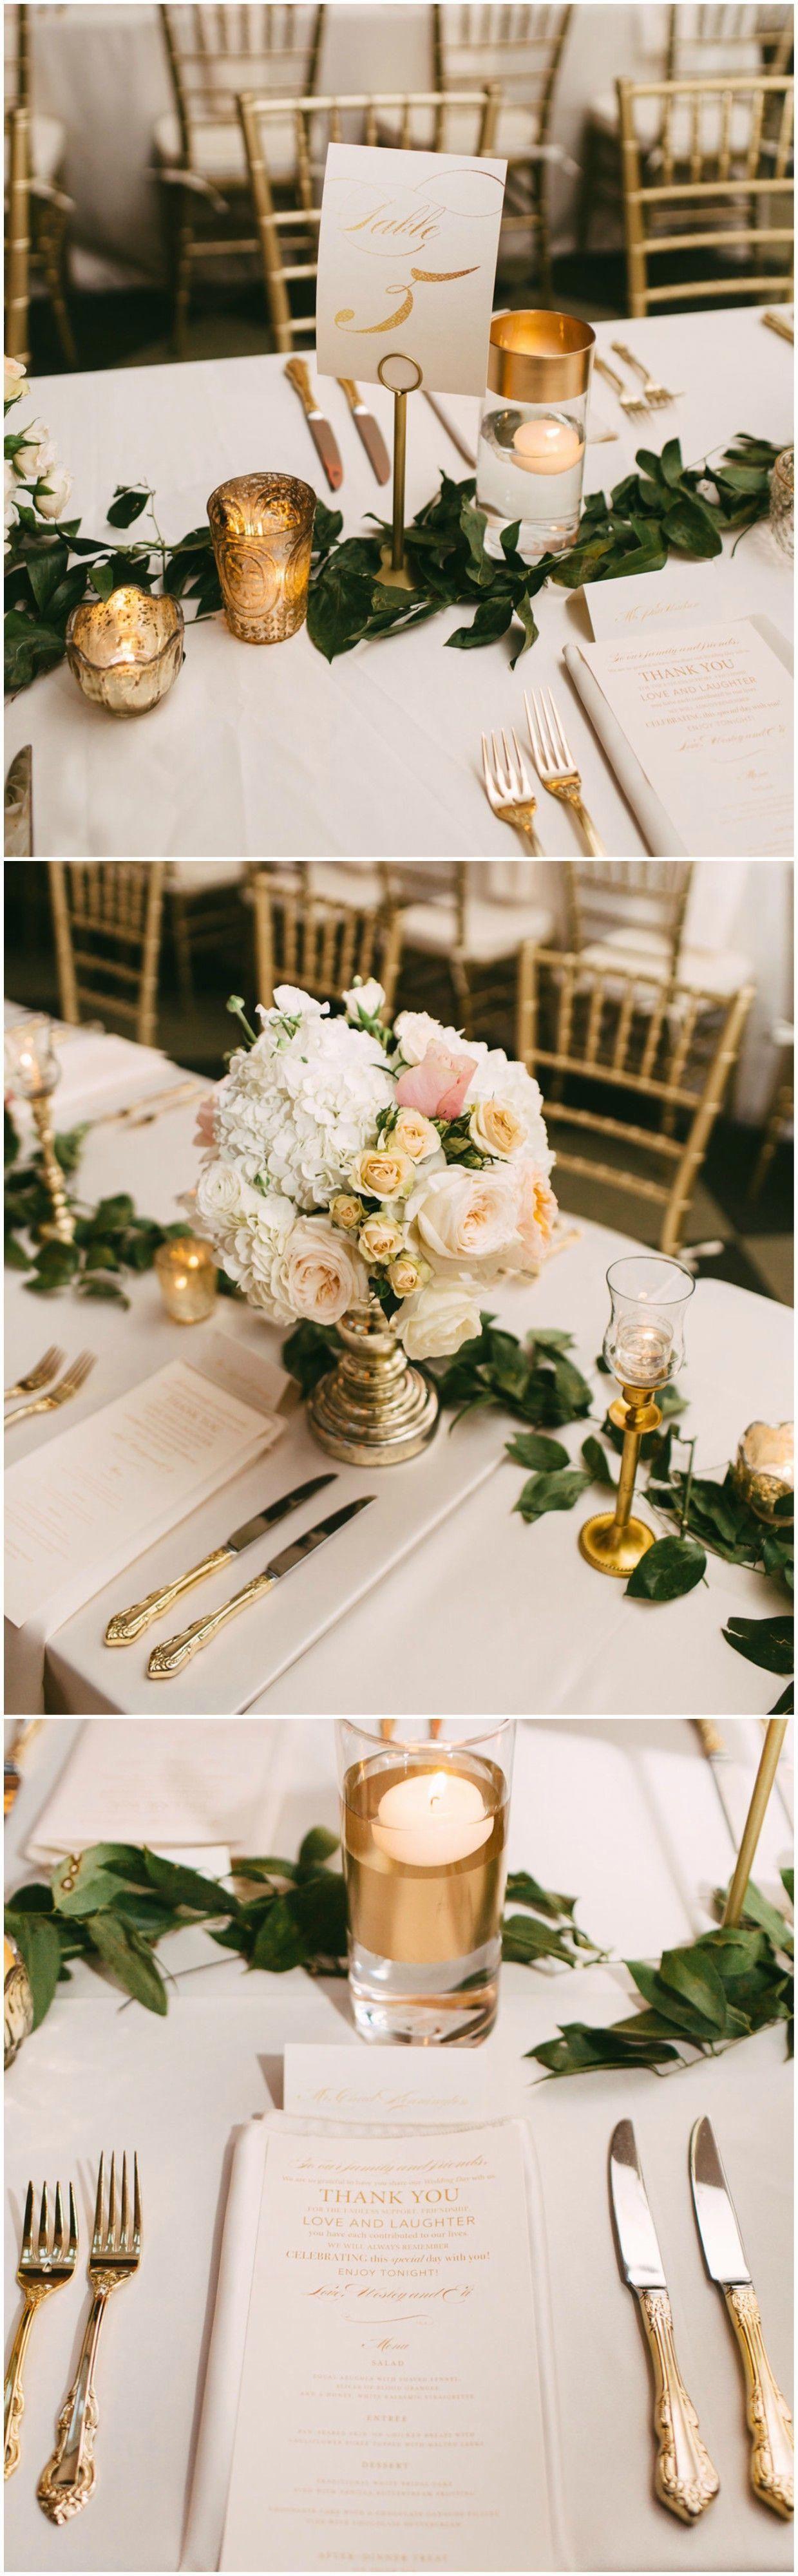 Traditional wedding decor ideas 2018  Indoor wedding reception gold flatware classic wedding table